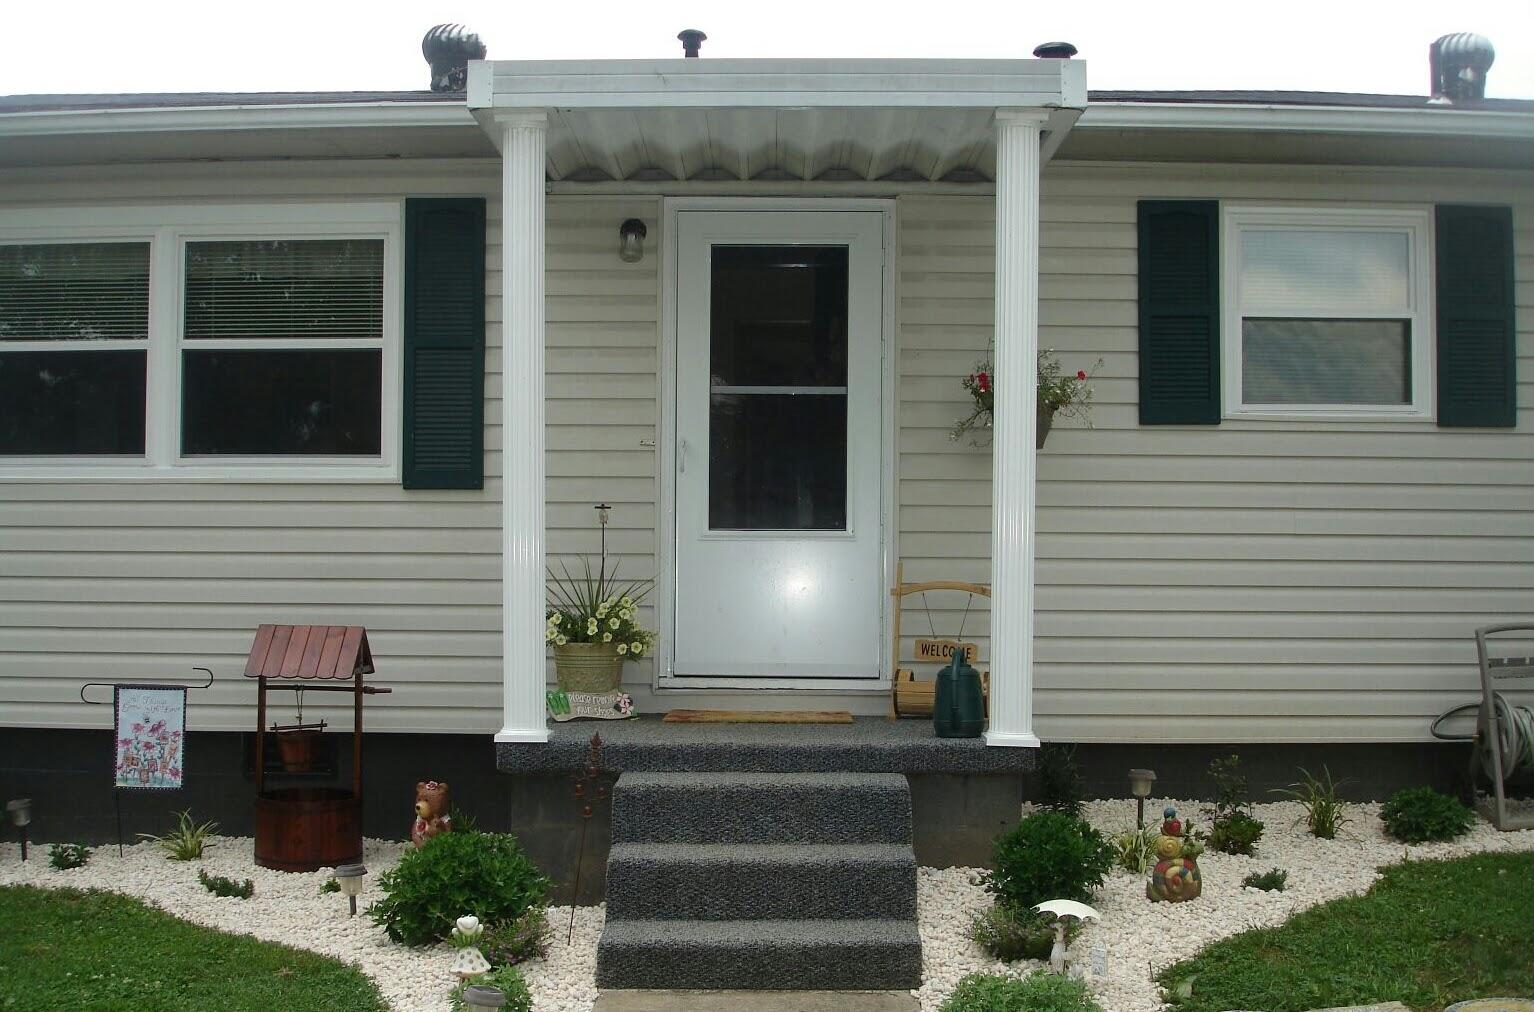 105 Thomas Street, Proctorville, Ohio 45669